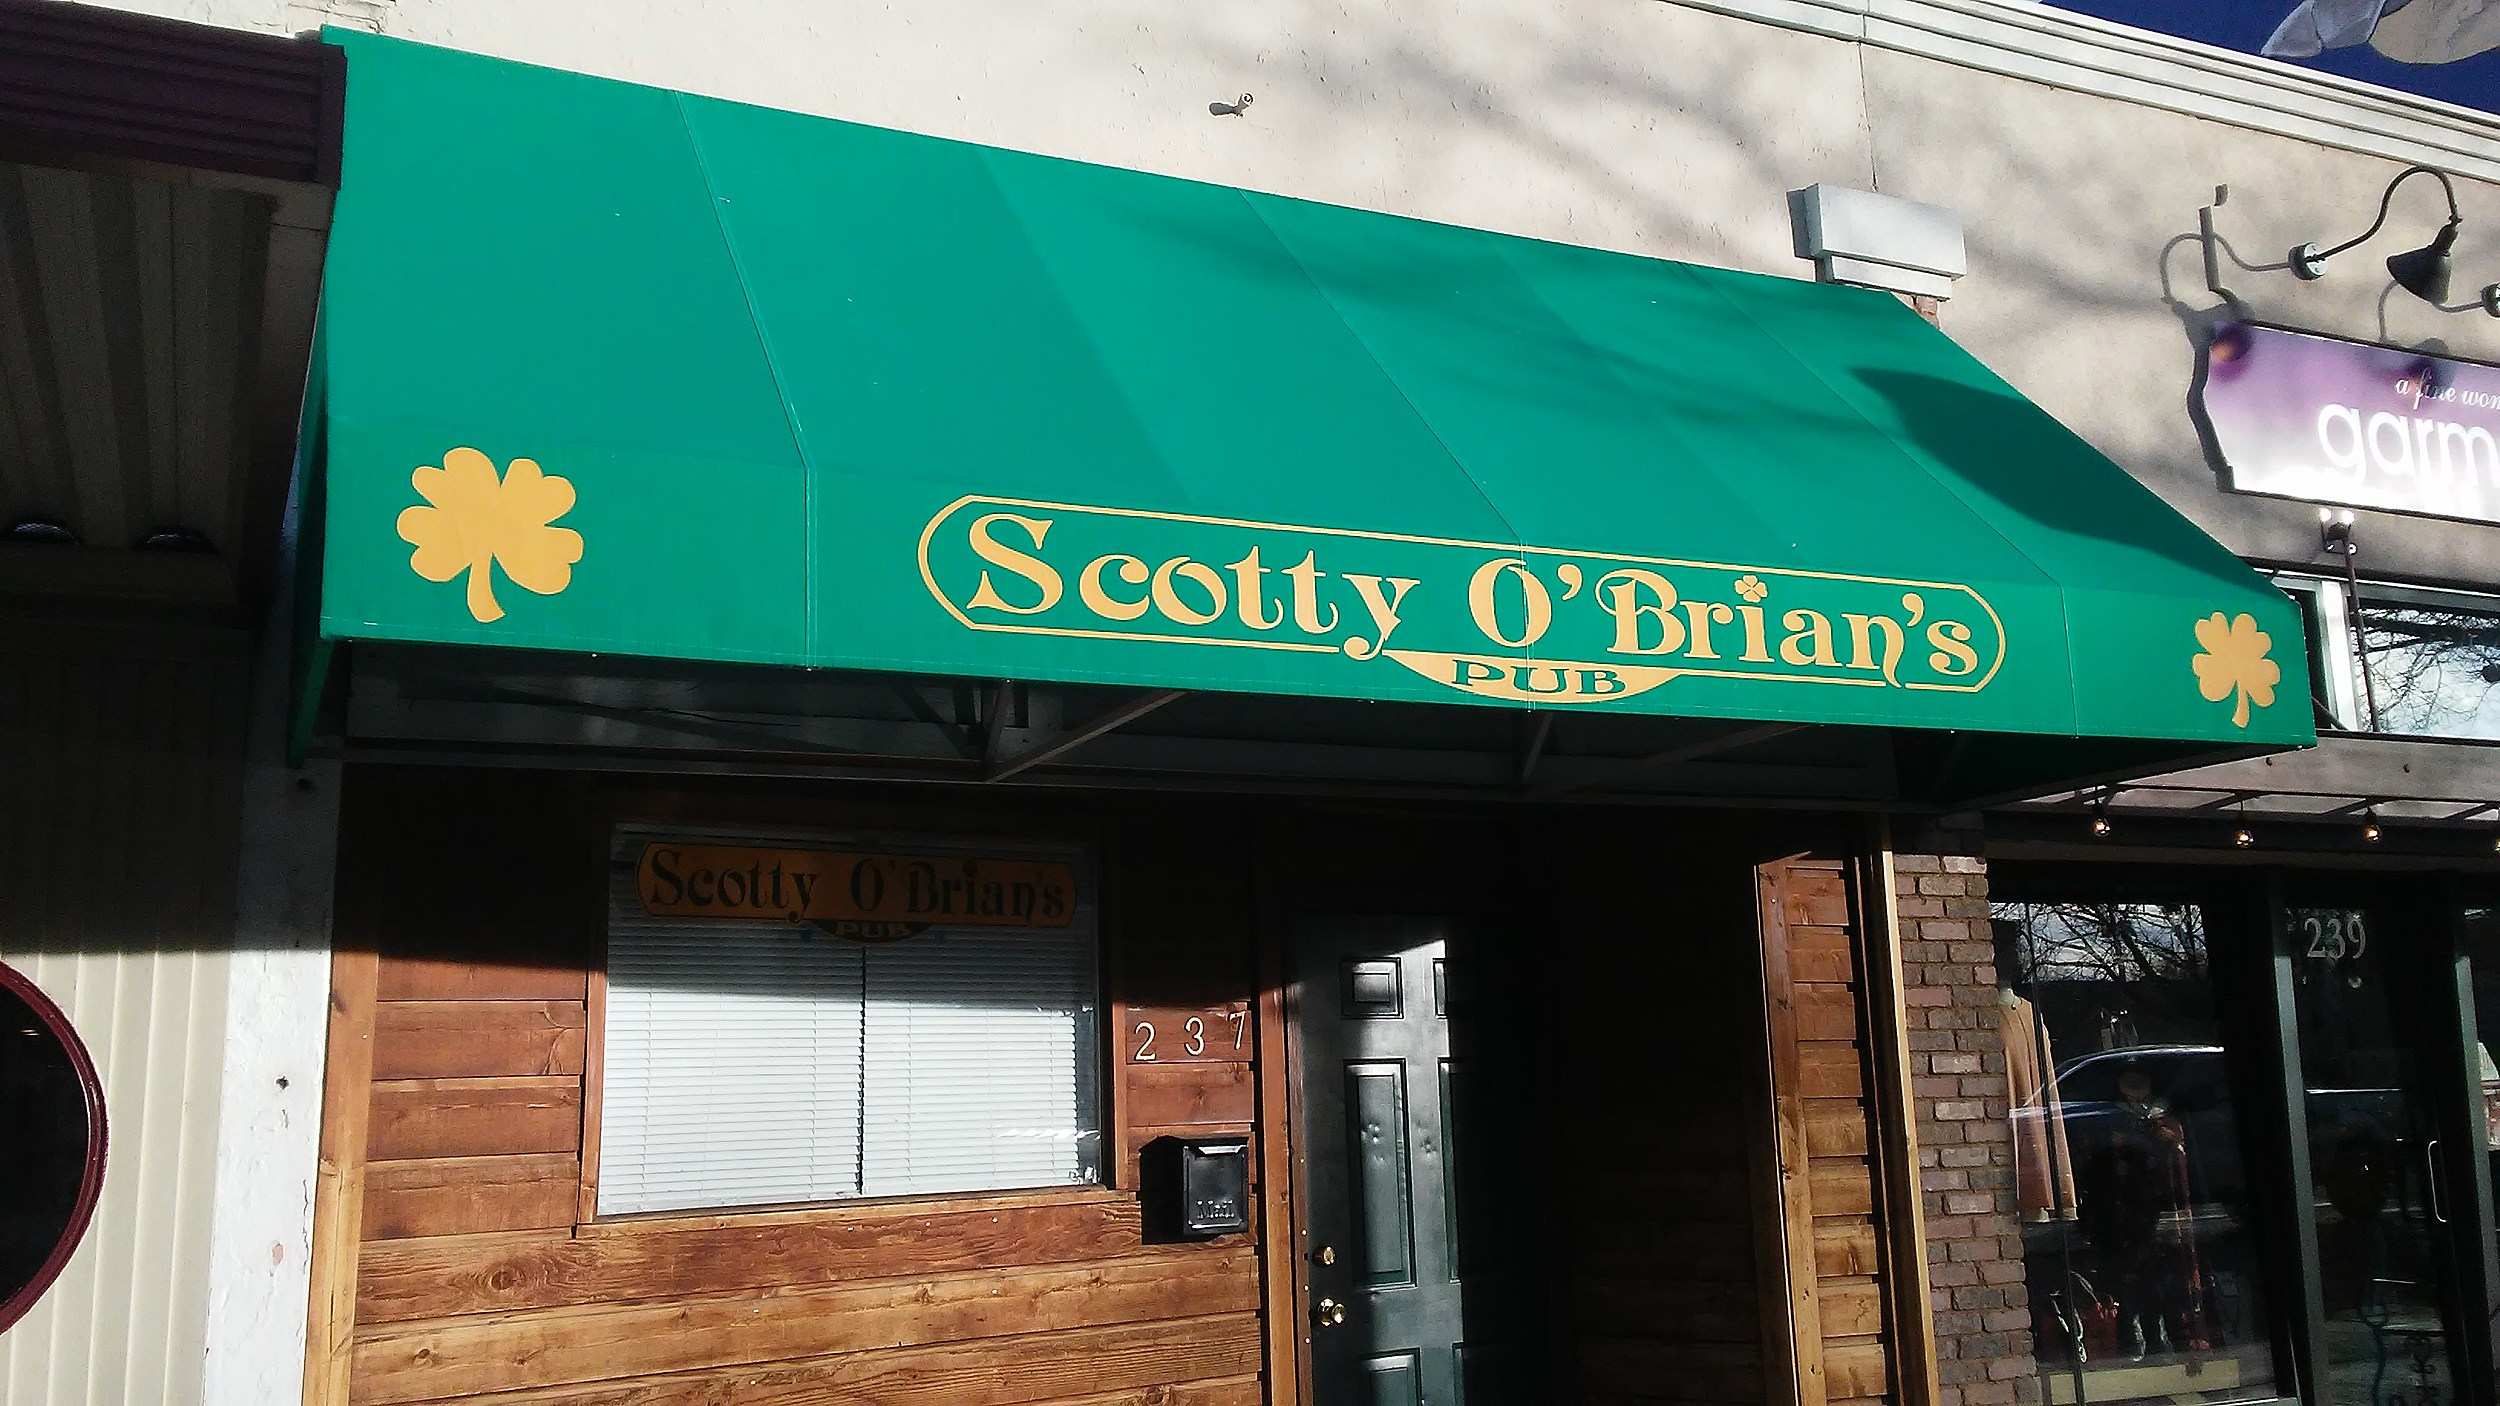 Scotty O'Brian's